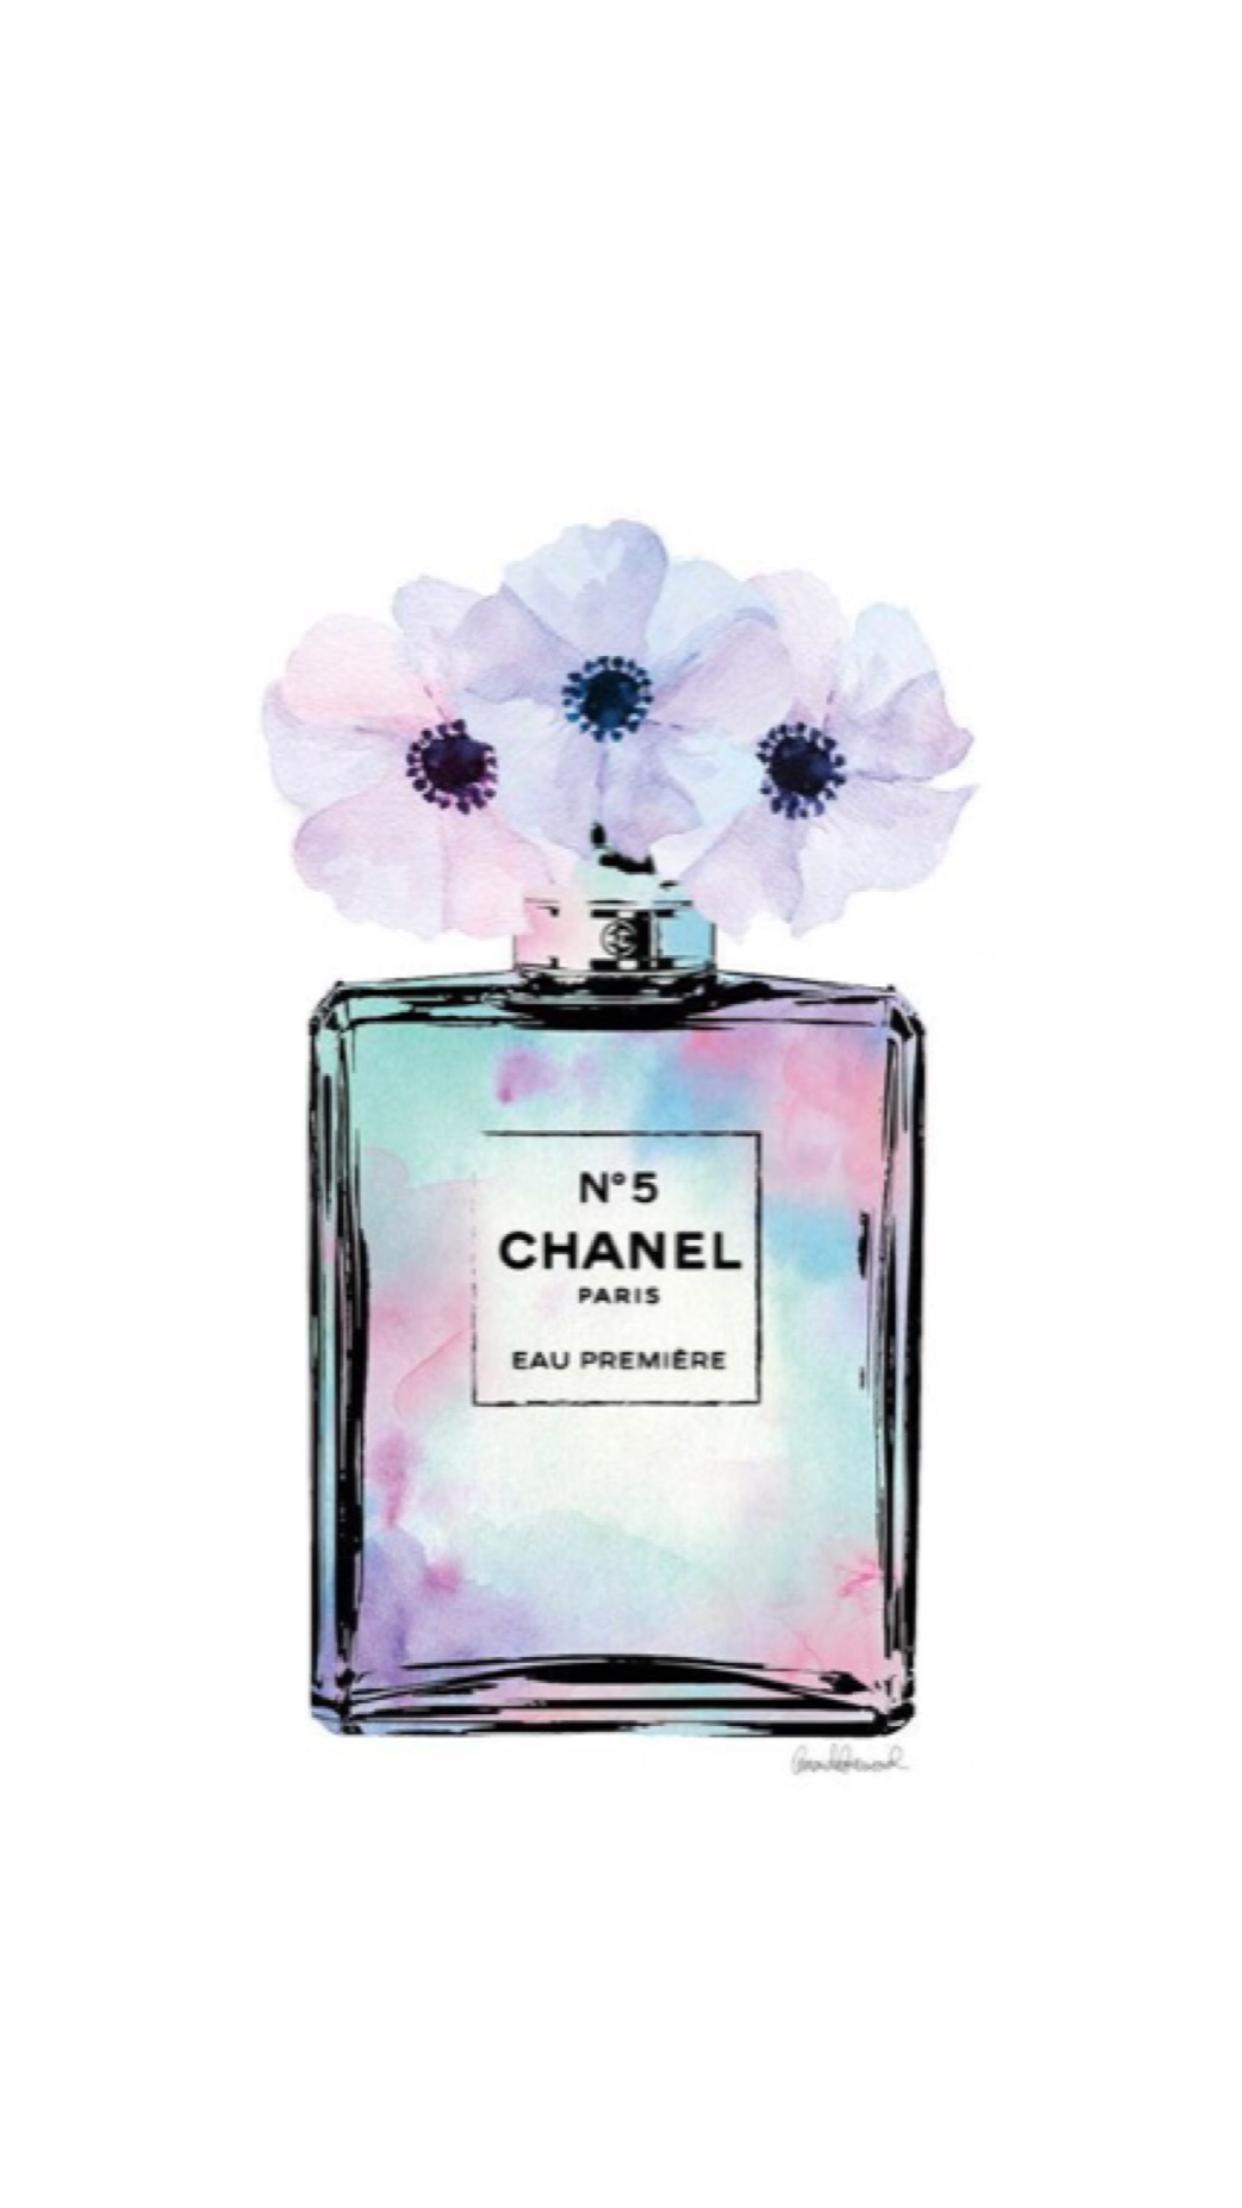 Pin By Outfits De Moda On Wallpapers Vol 41 Perfume Bottles Chanel Art Perfume Art